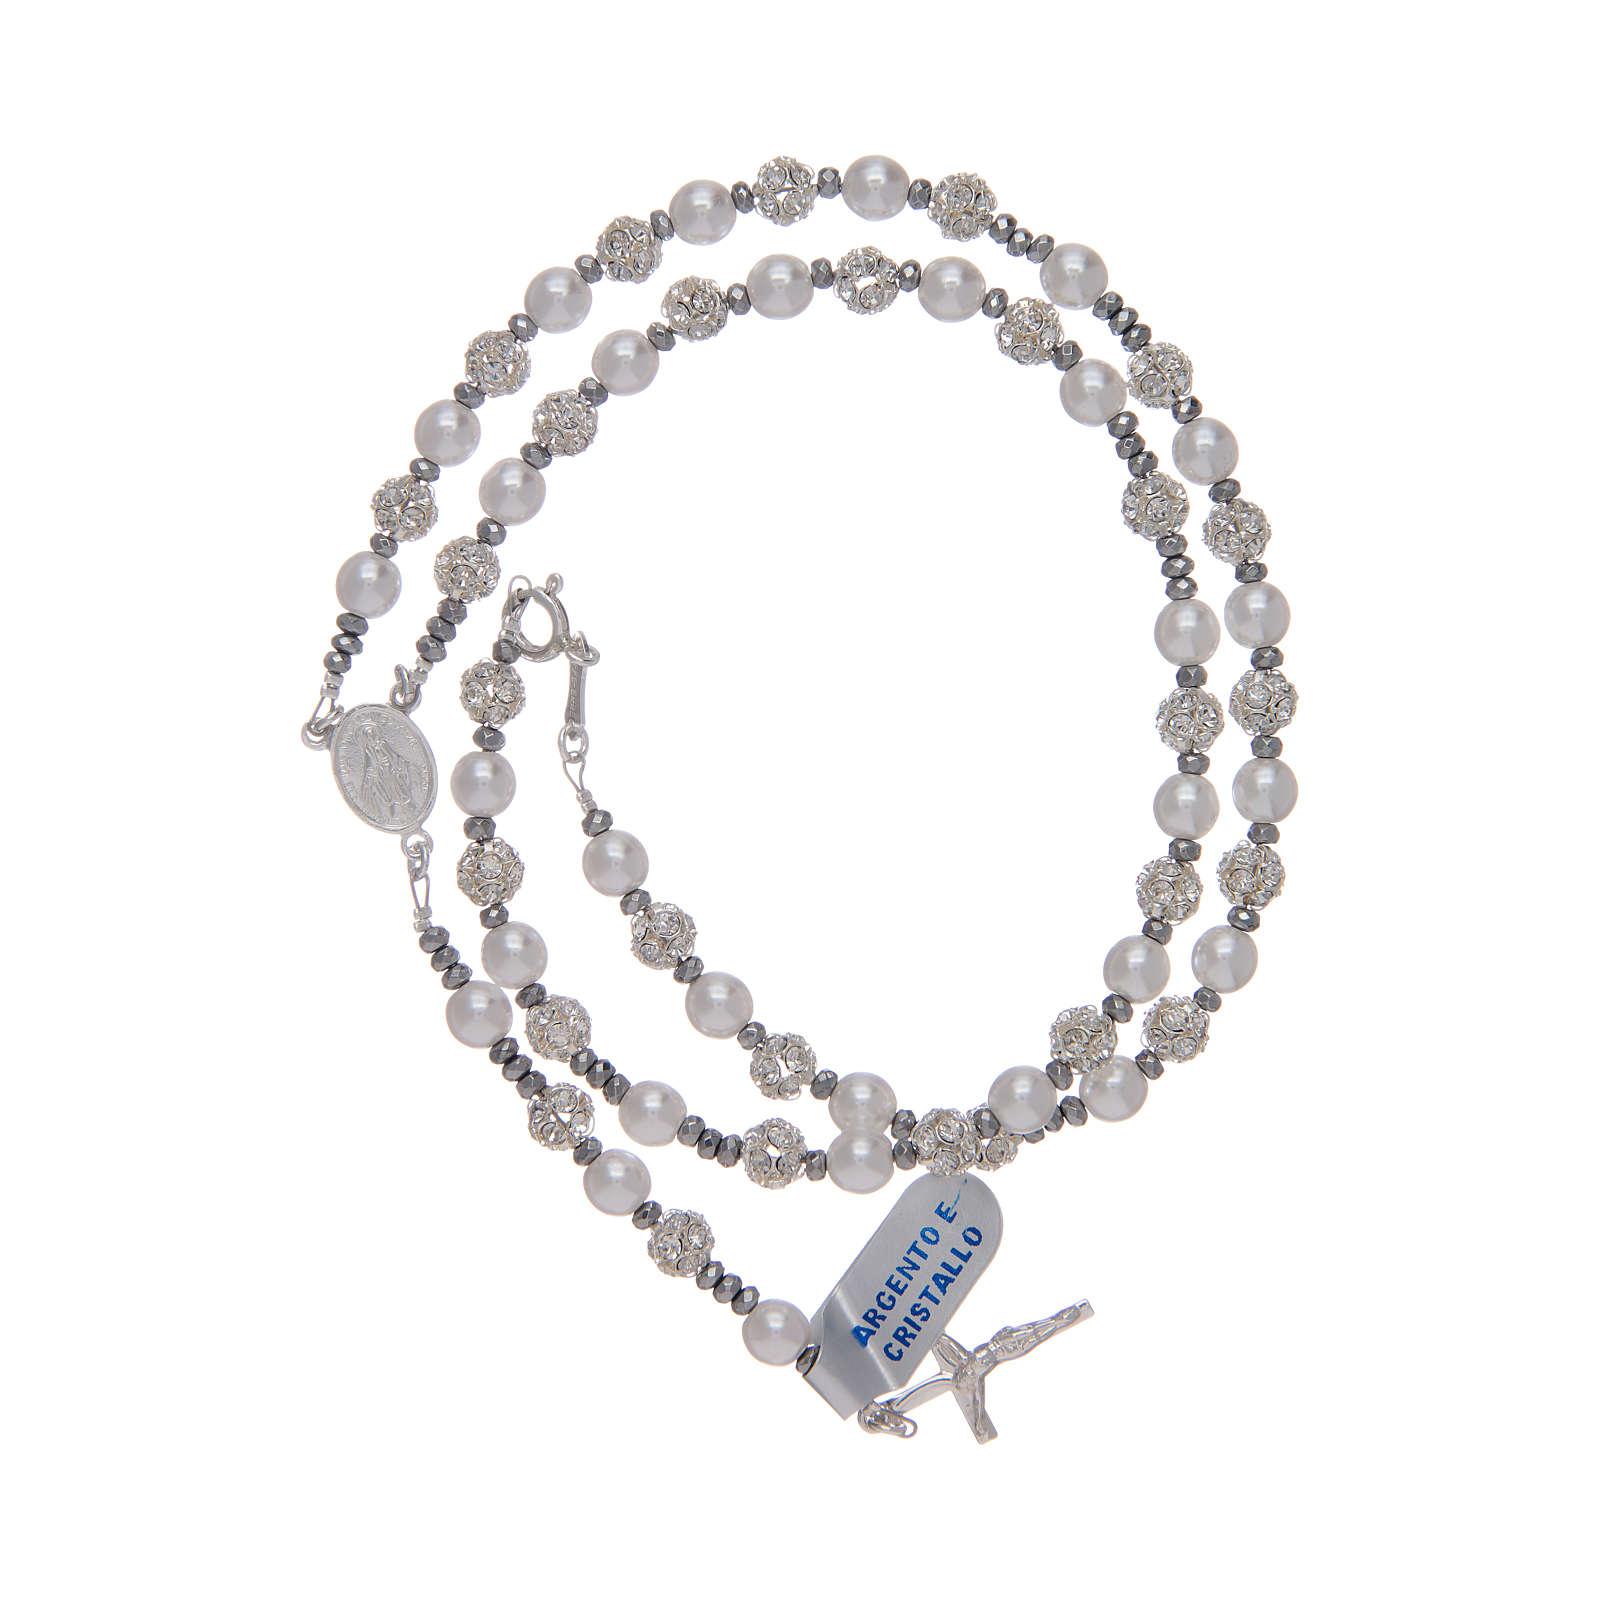 Rosario in argento 800 con strassball e perle 4